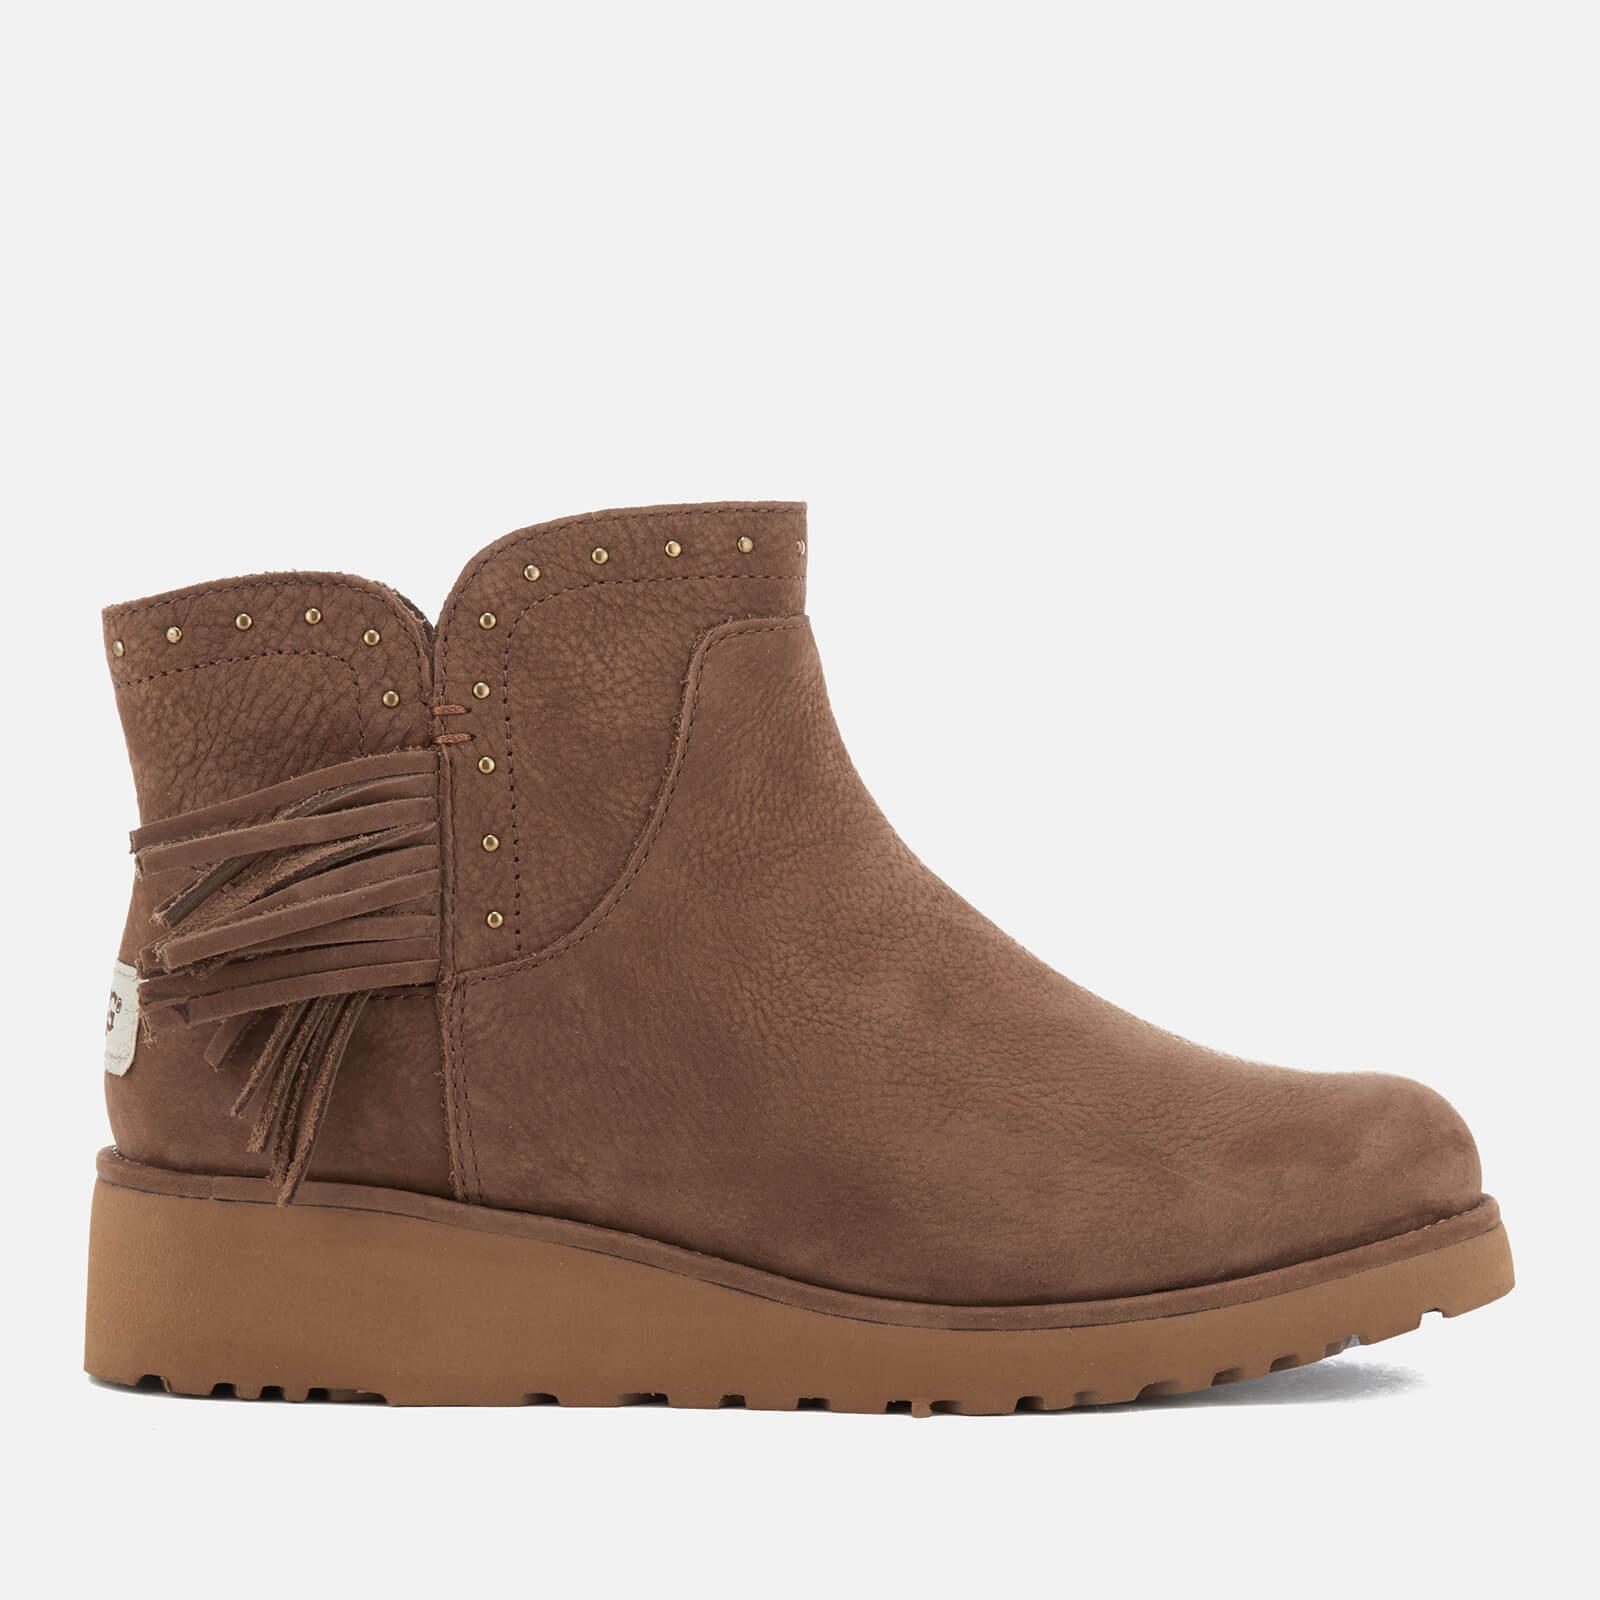 e4a18b48c84 UGG Women's Cindy Leather Tassle Ankle Boots - Dark Chestnut